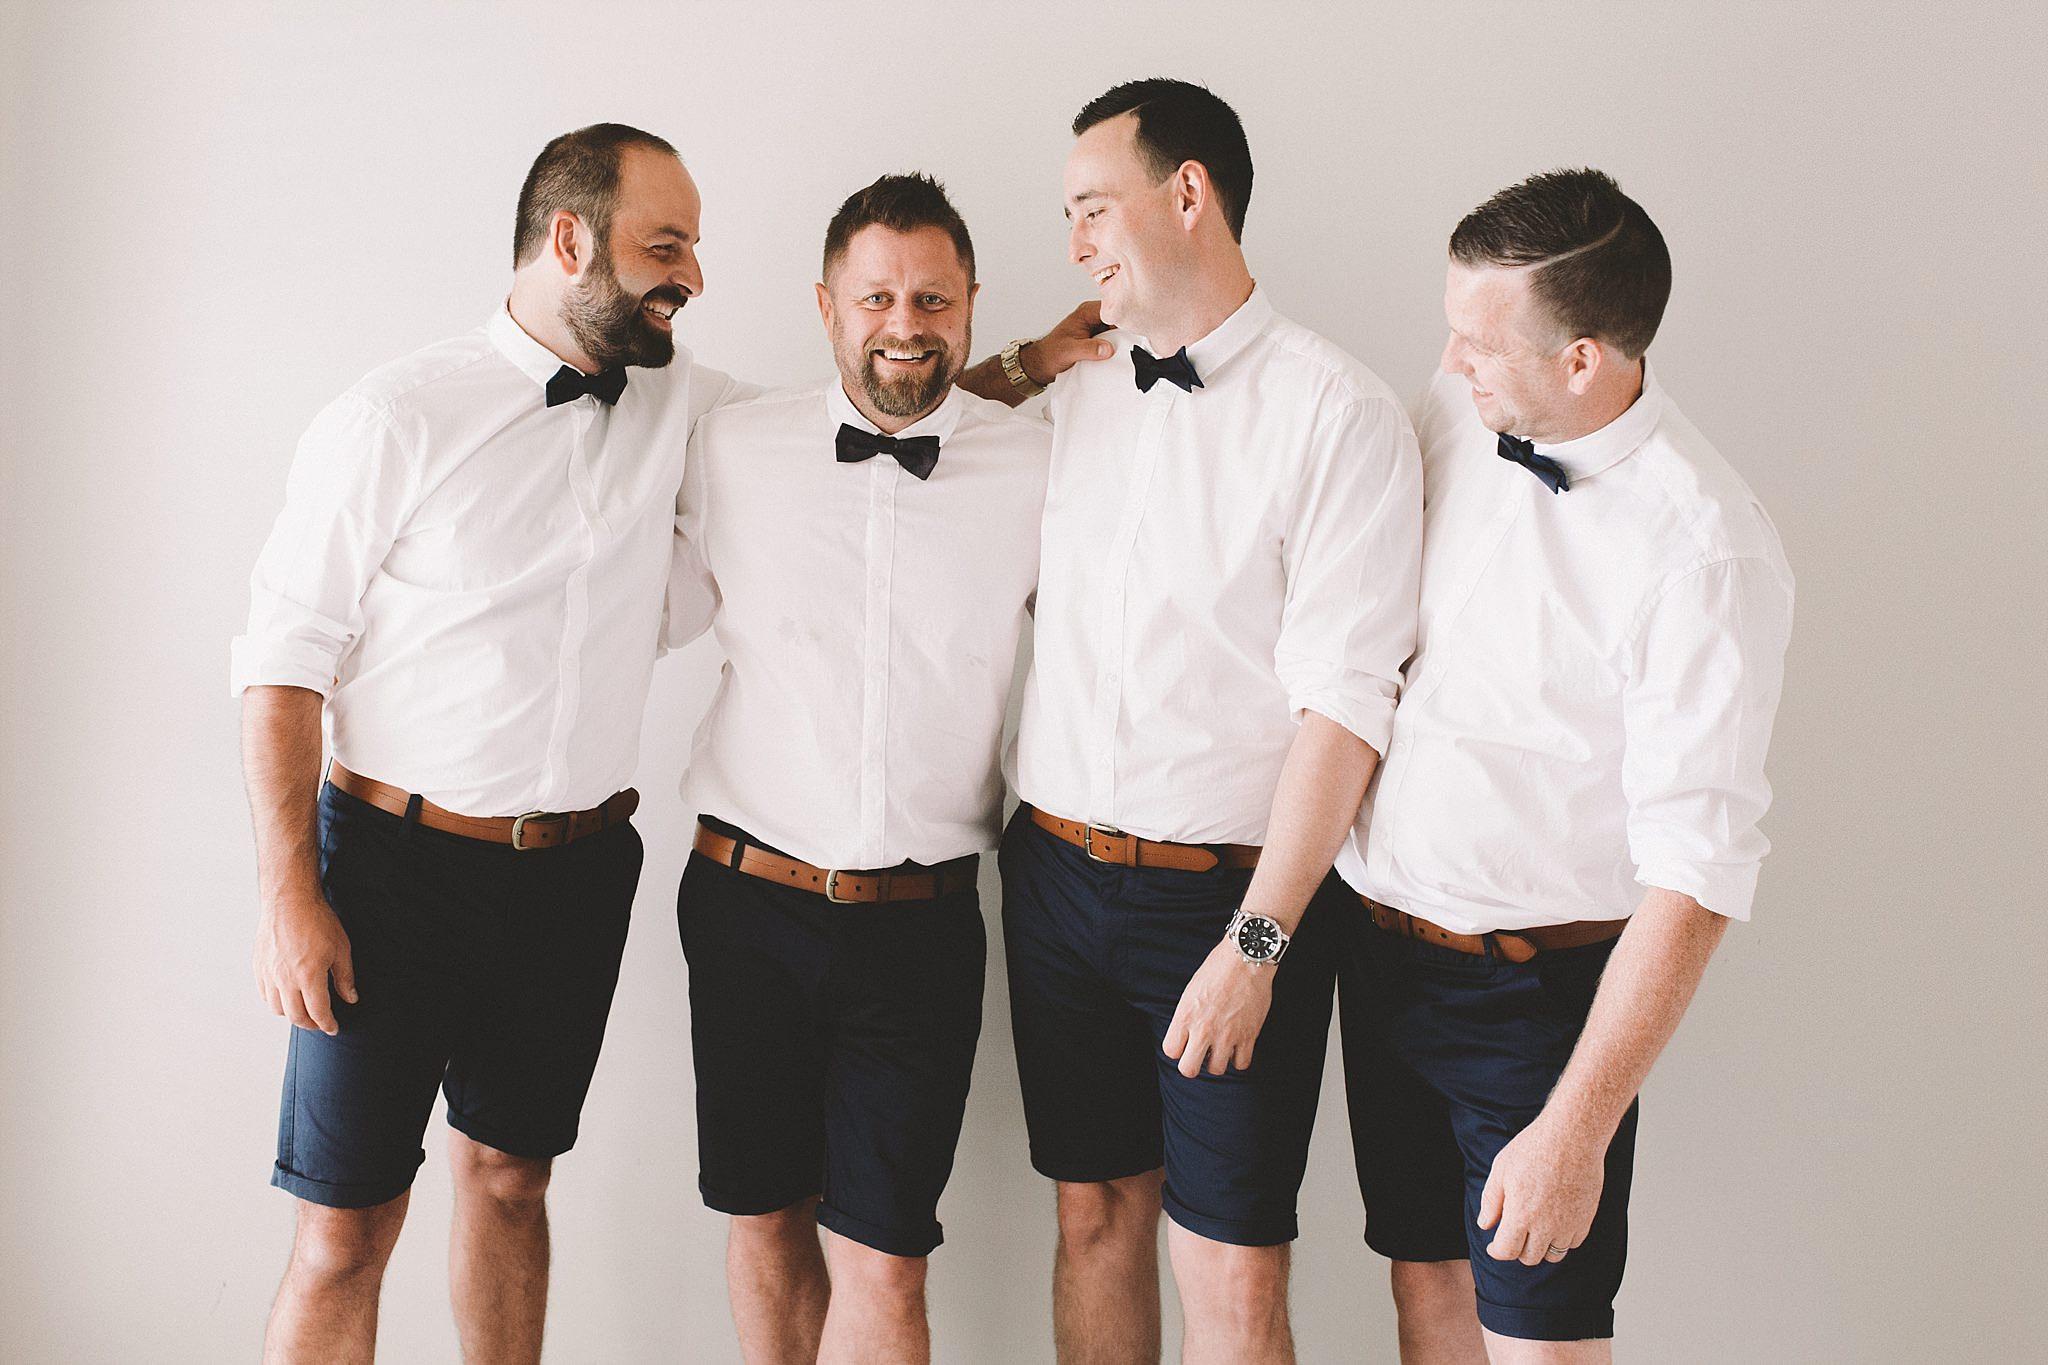 Mornington Peninsula Wedding Photographer 10.JPG